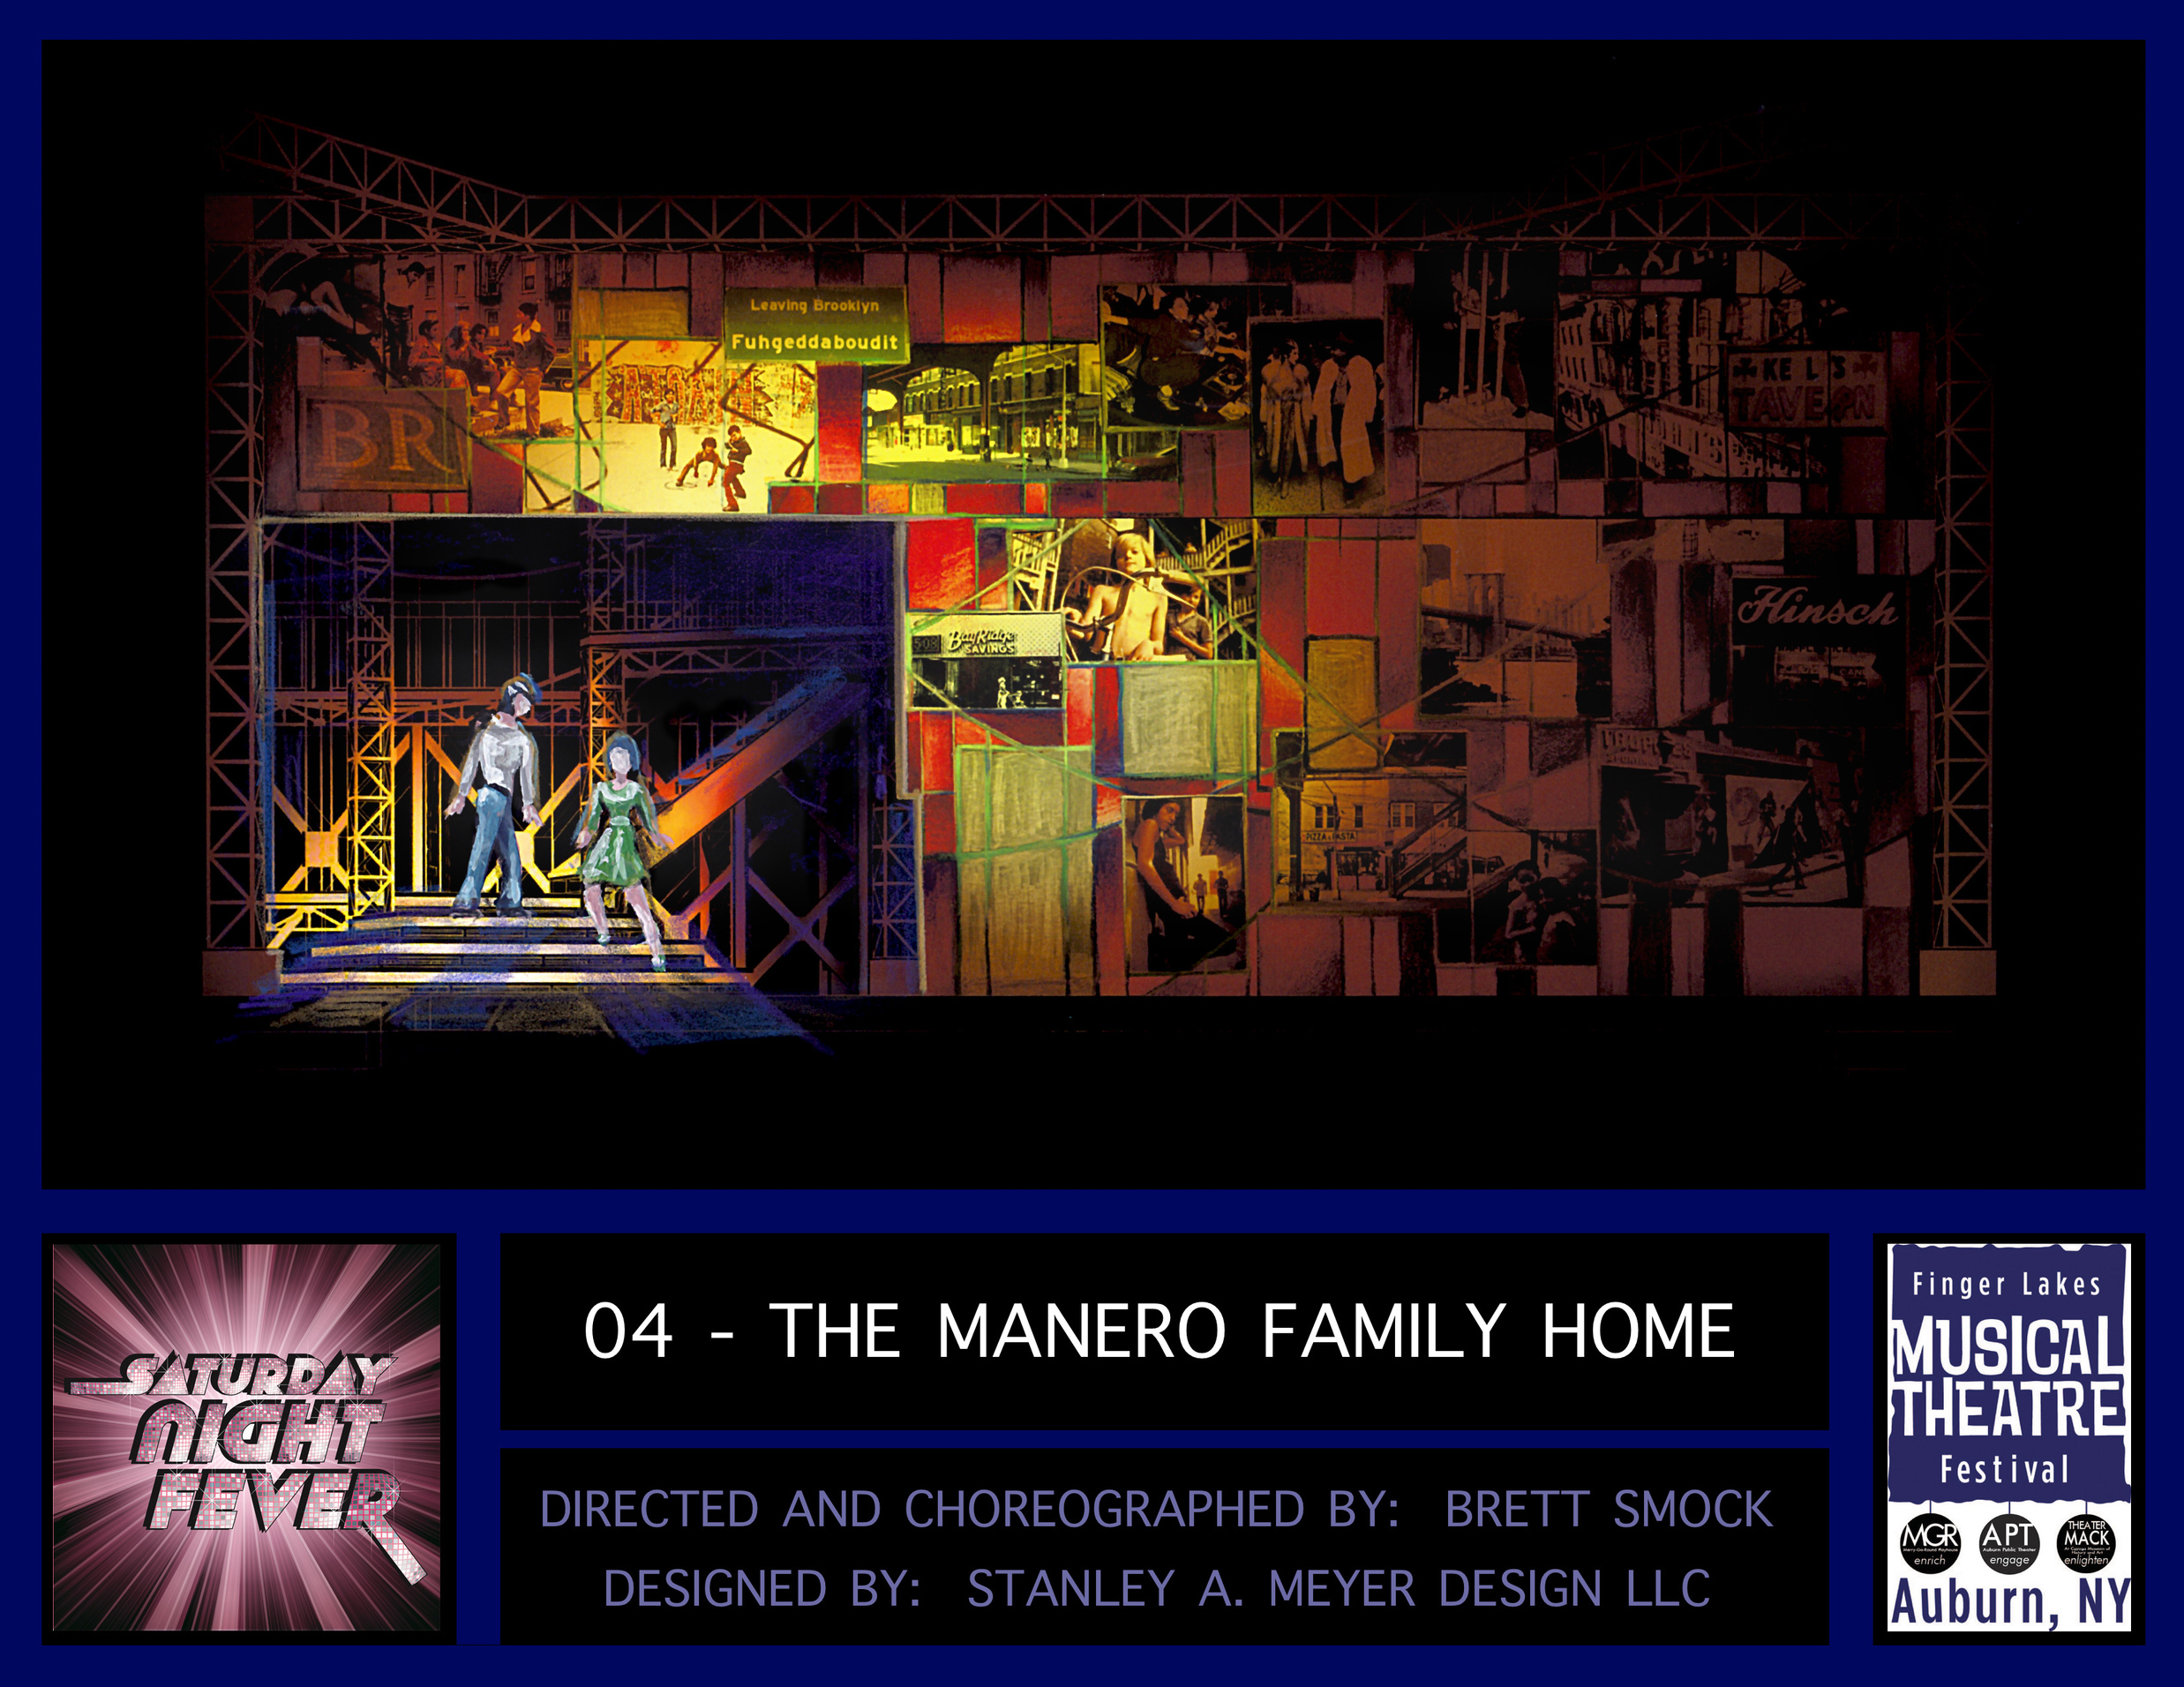 snf-04-manero_family_home.jpg